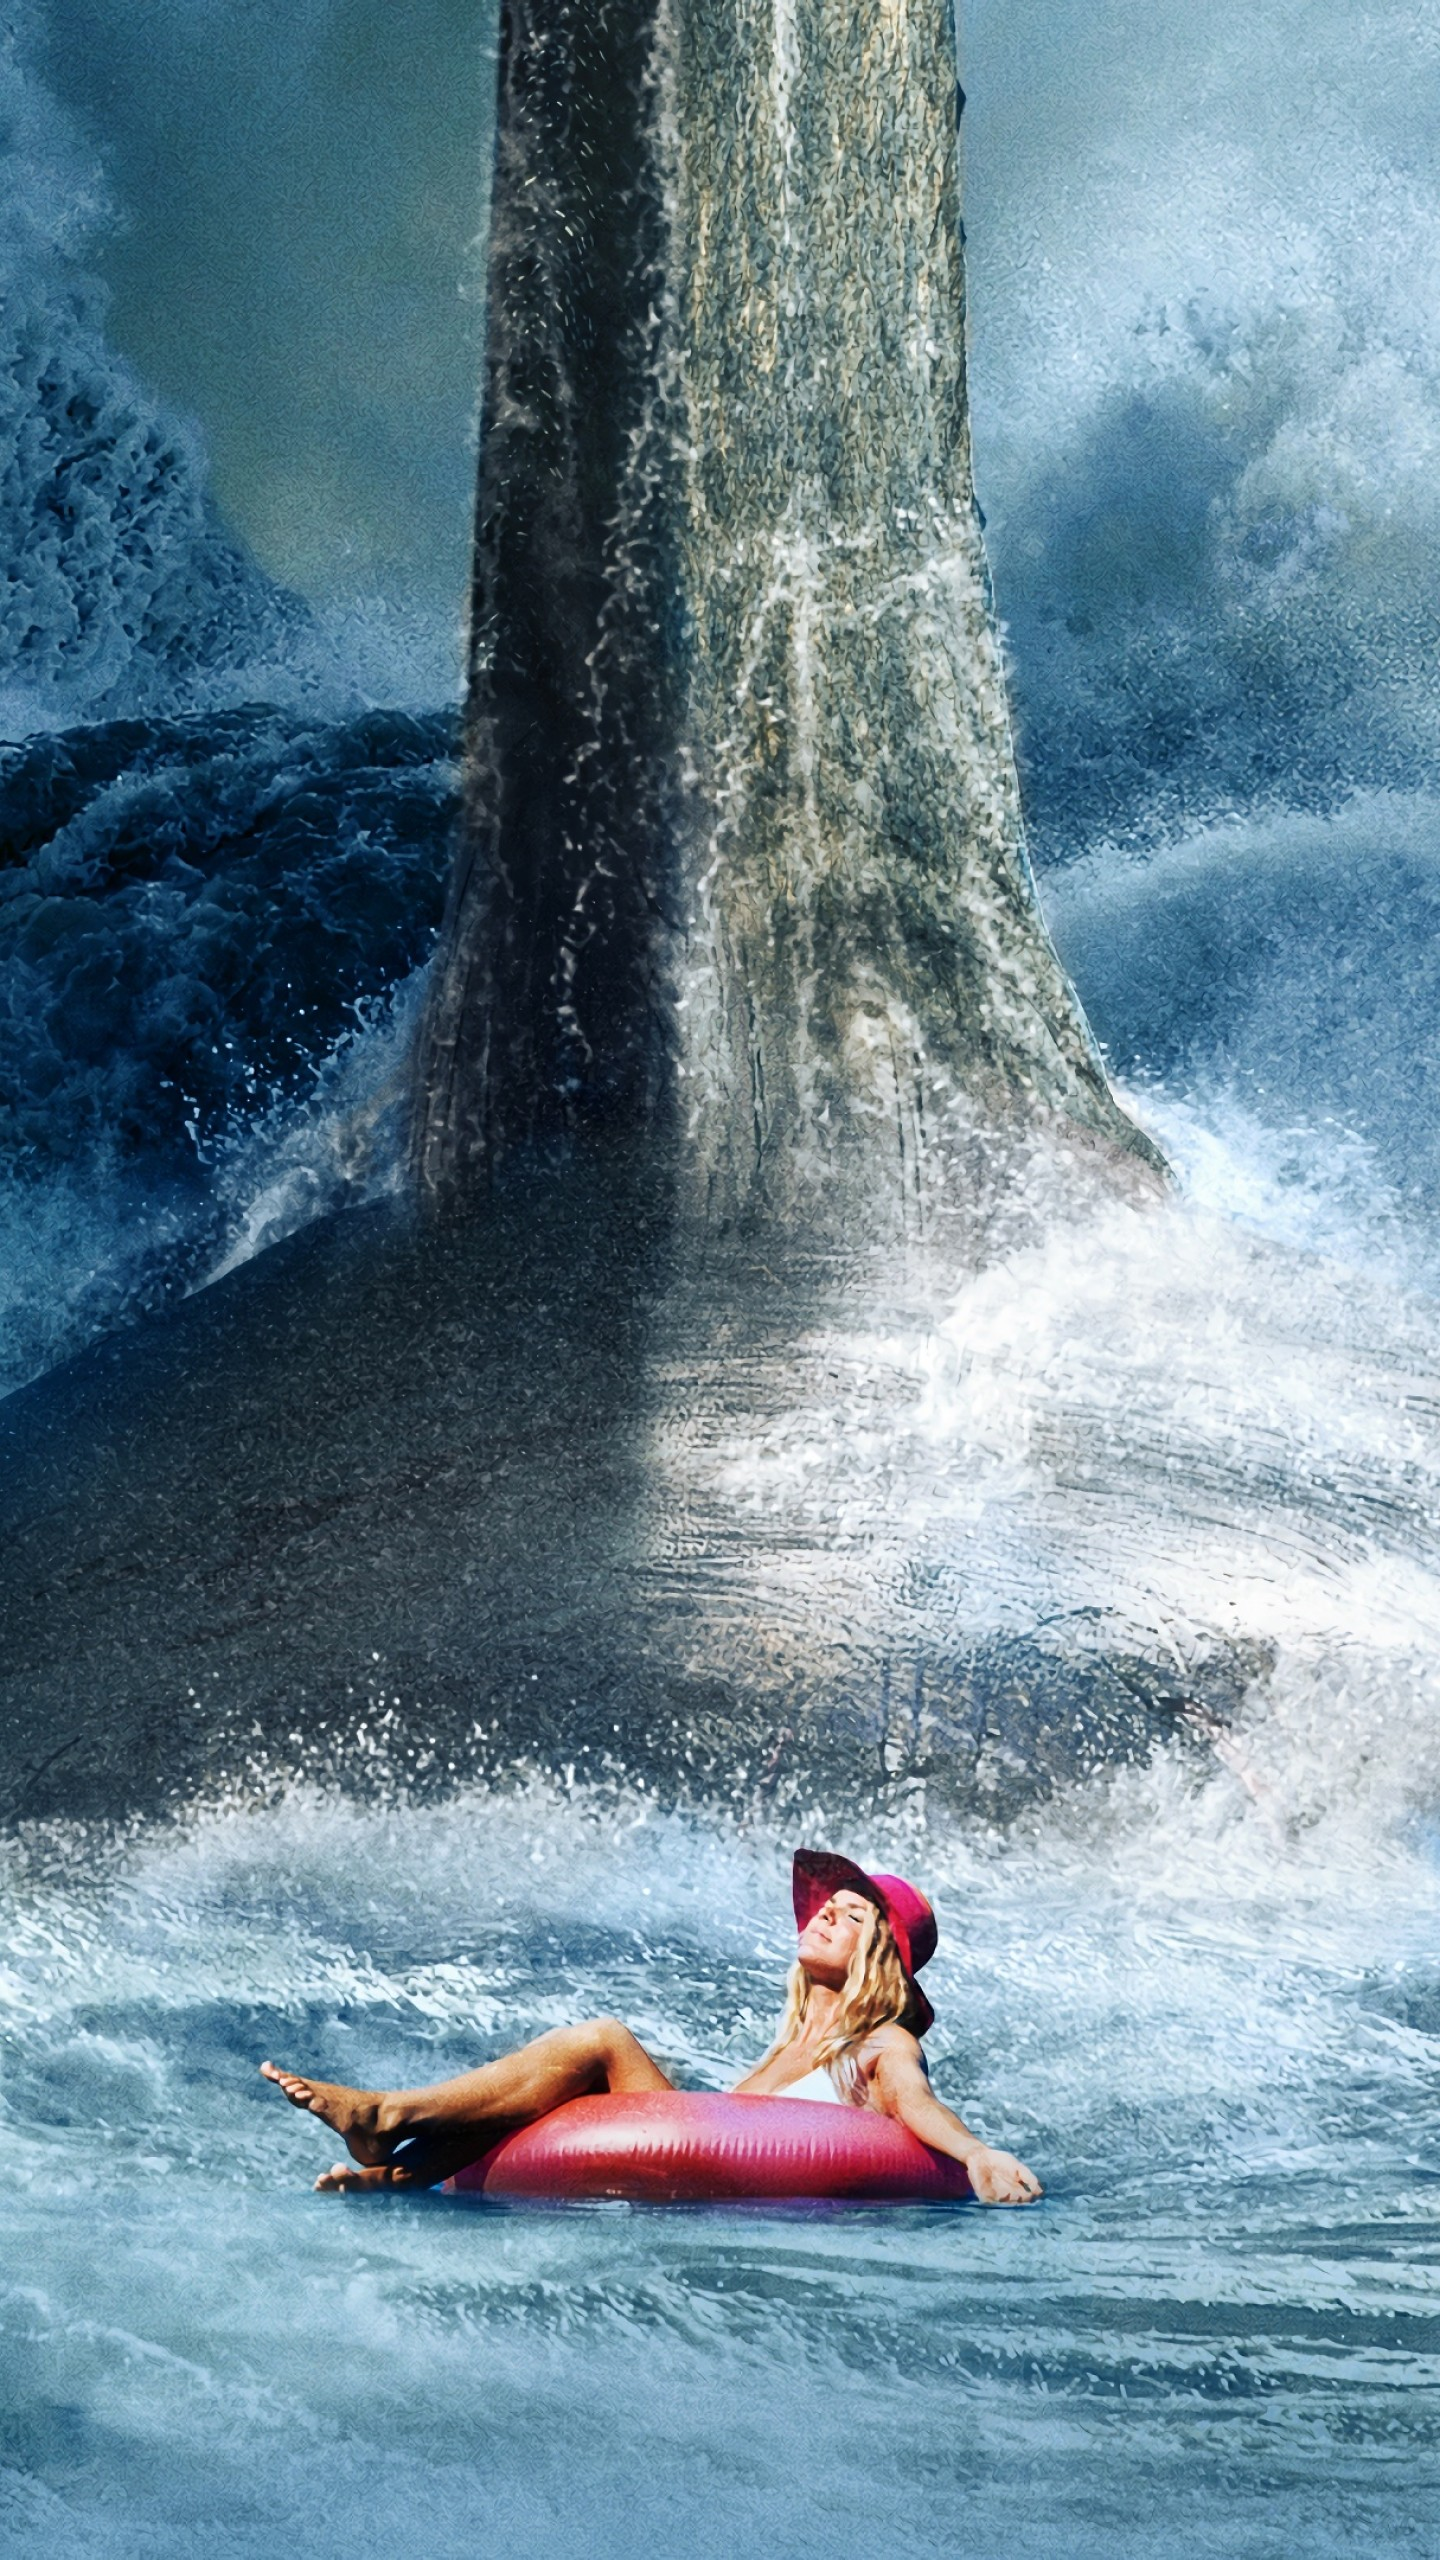 Wallpaper The Meg, Poster, 4K, Movies #19618